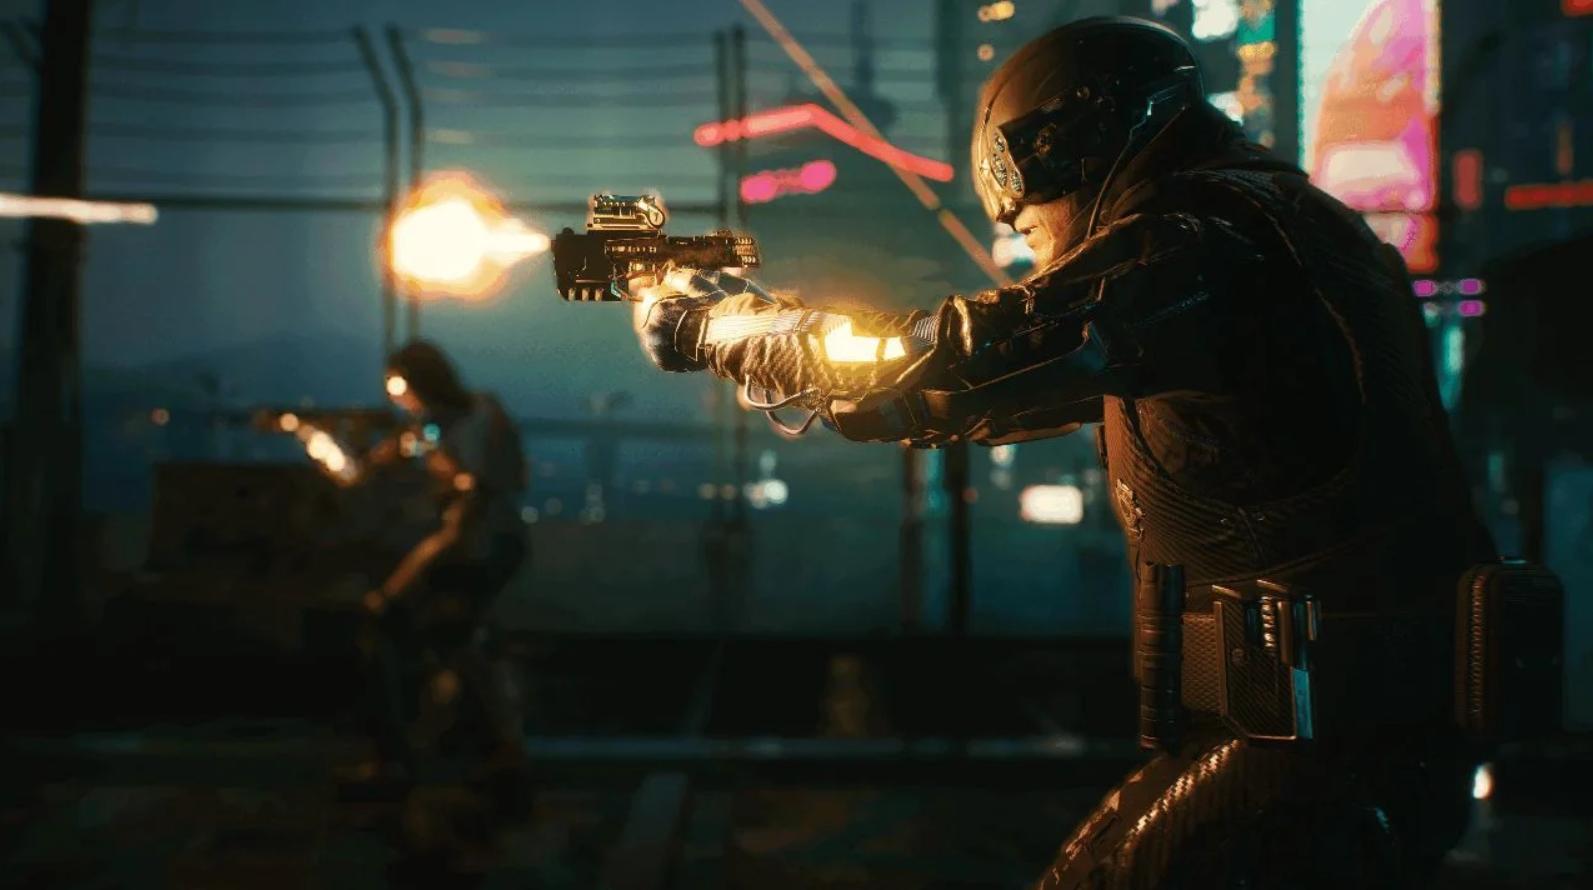 Cyberpunk 2077: a bug can break the game on PC